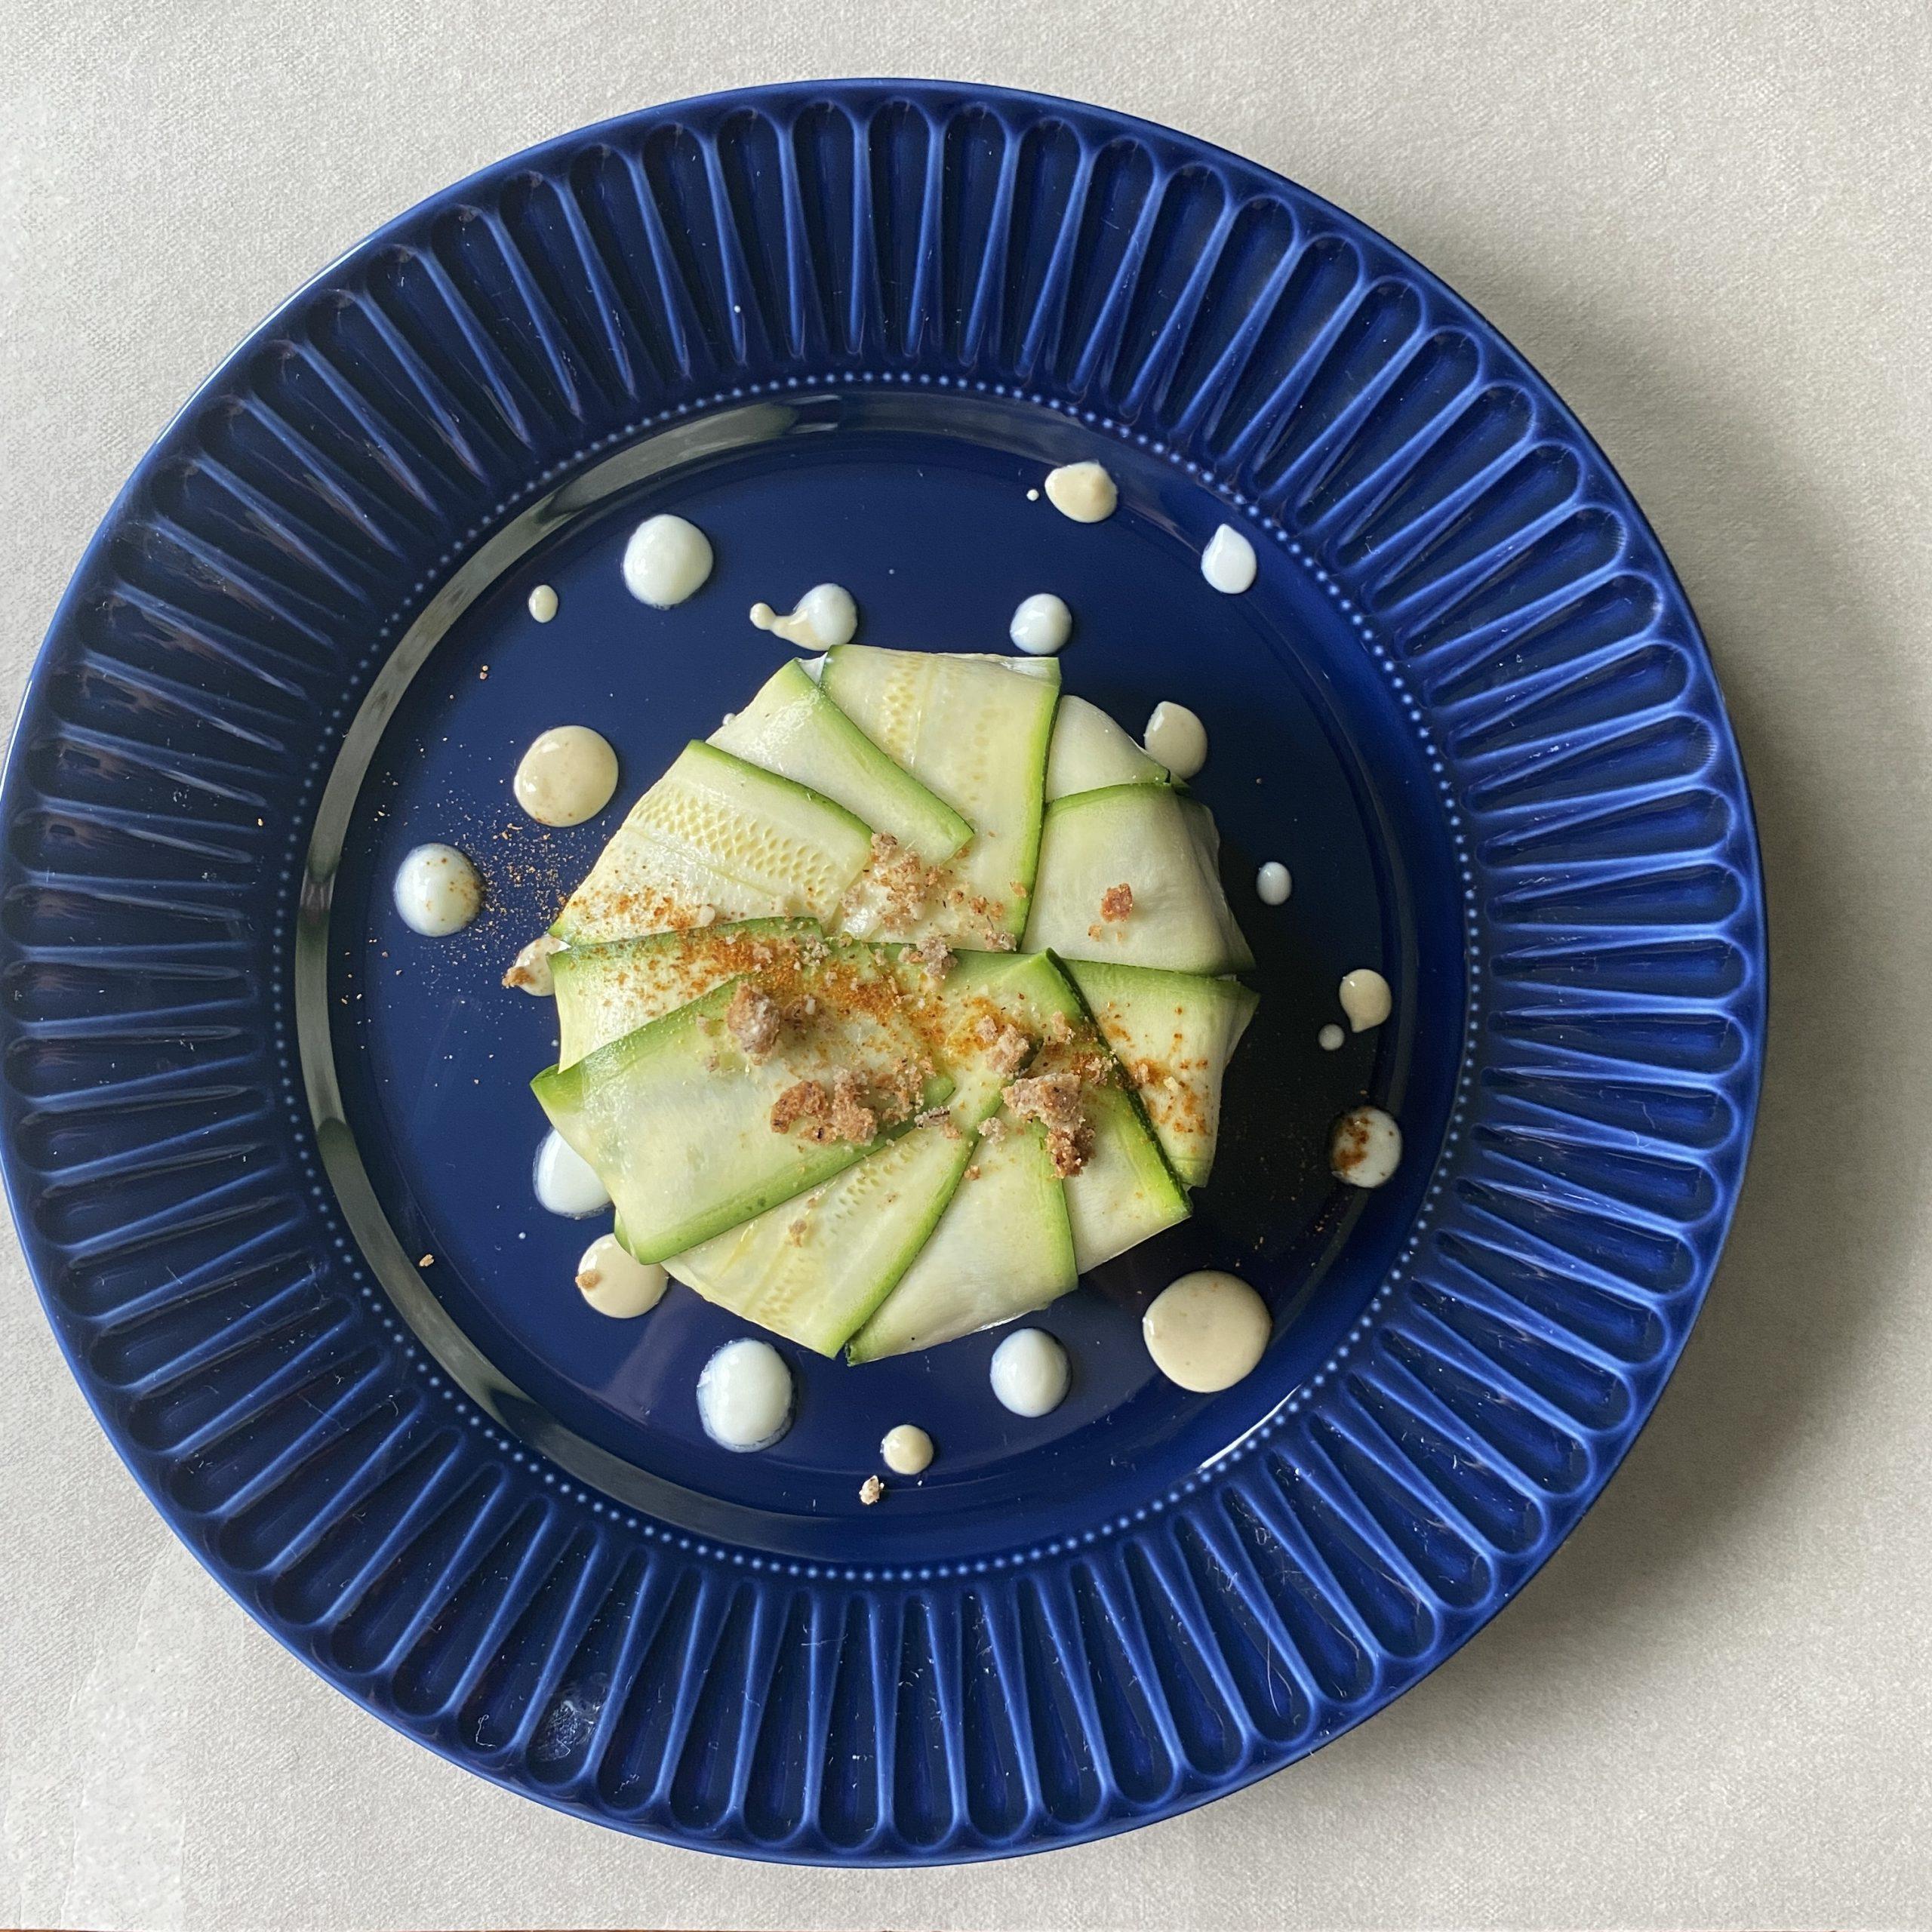 Tortino freddo di zucchine ricotta e salmone